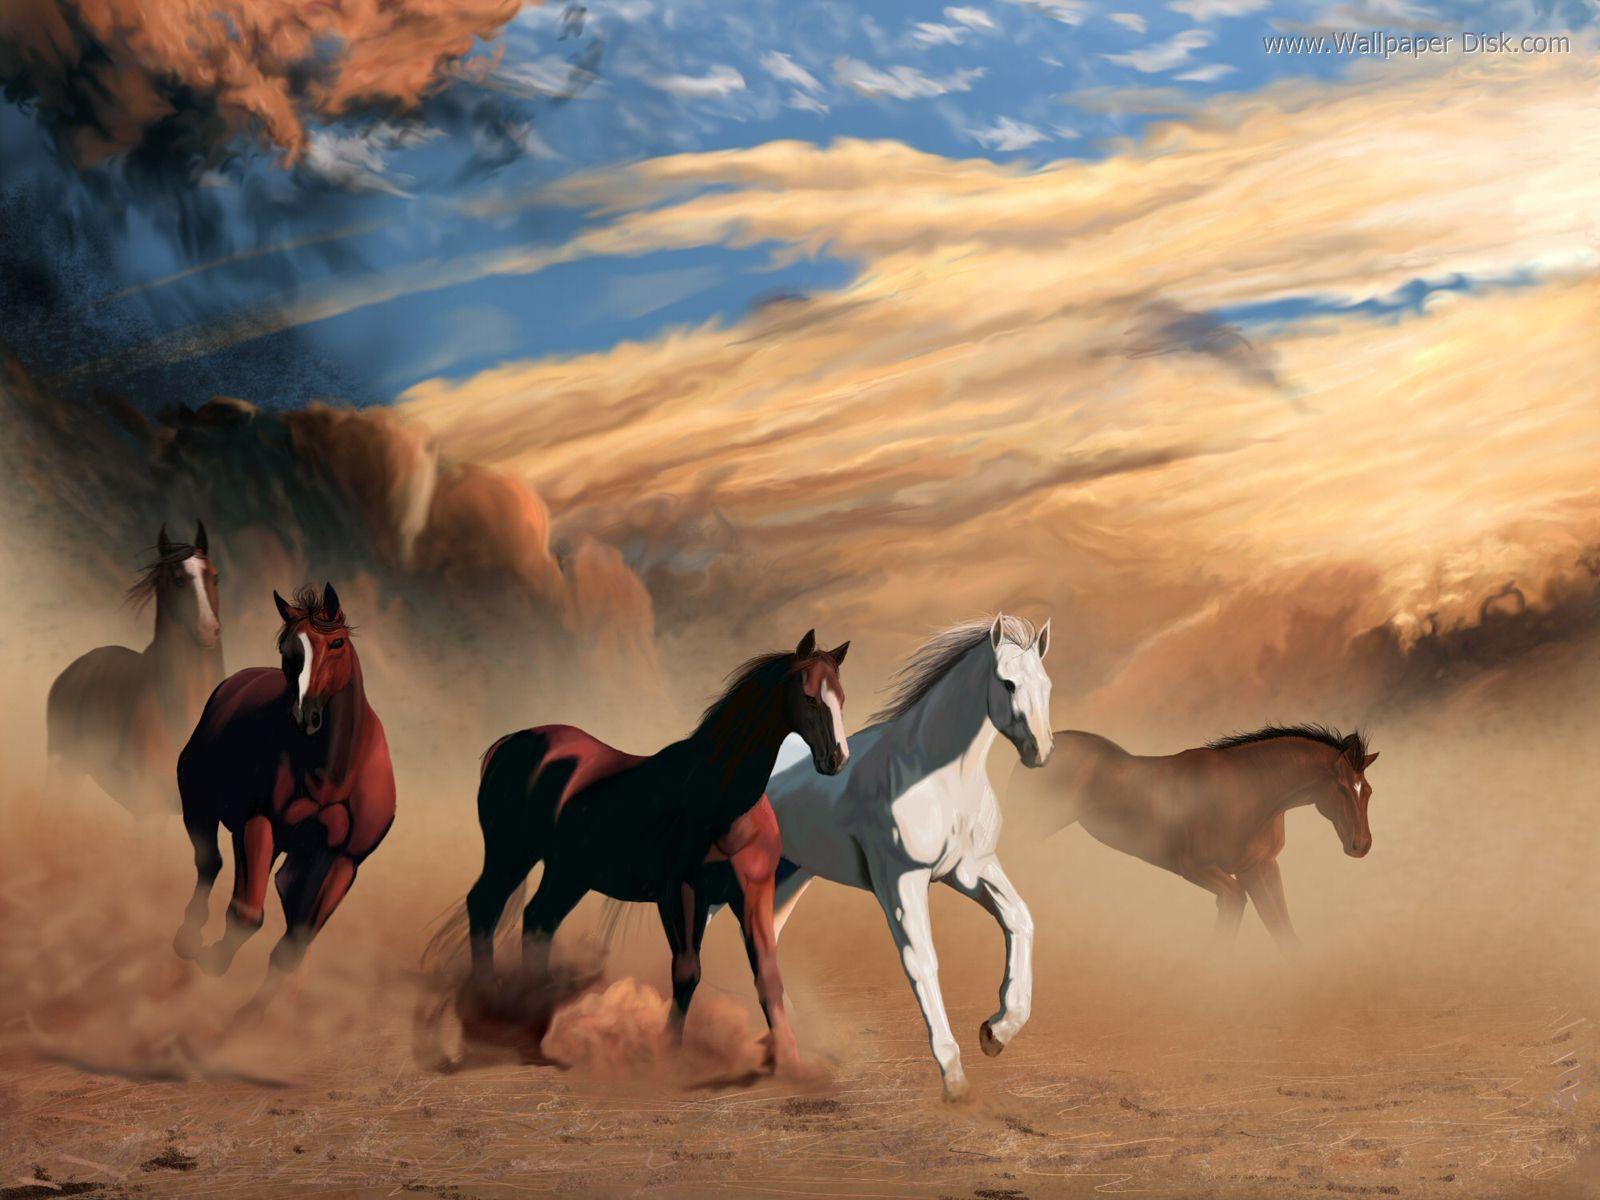 Horses Running Wallpaper Wild Horse Pictures Horse Wallpaper Wild Horses Running